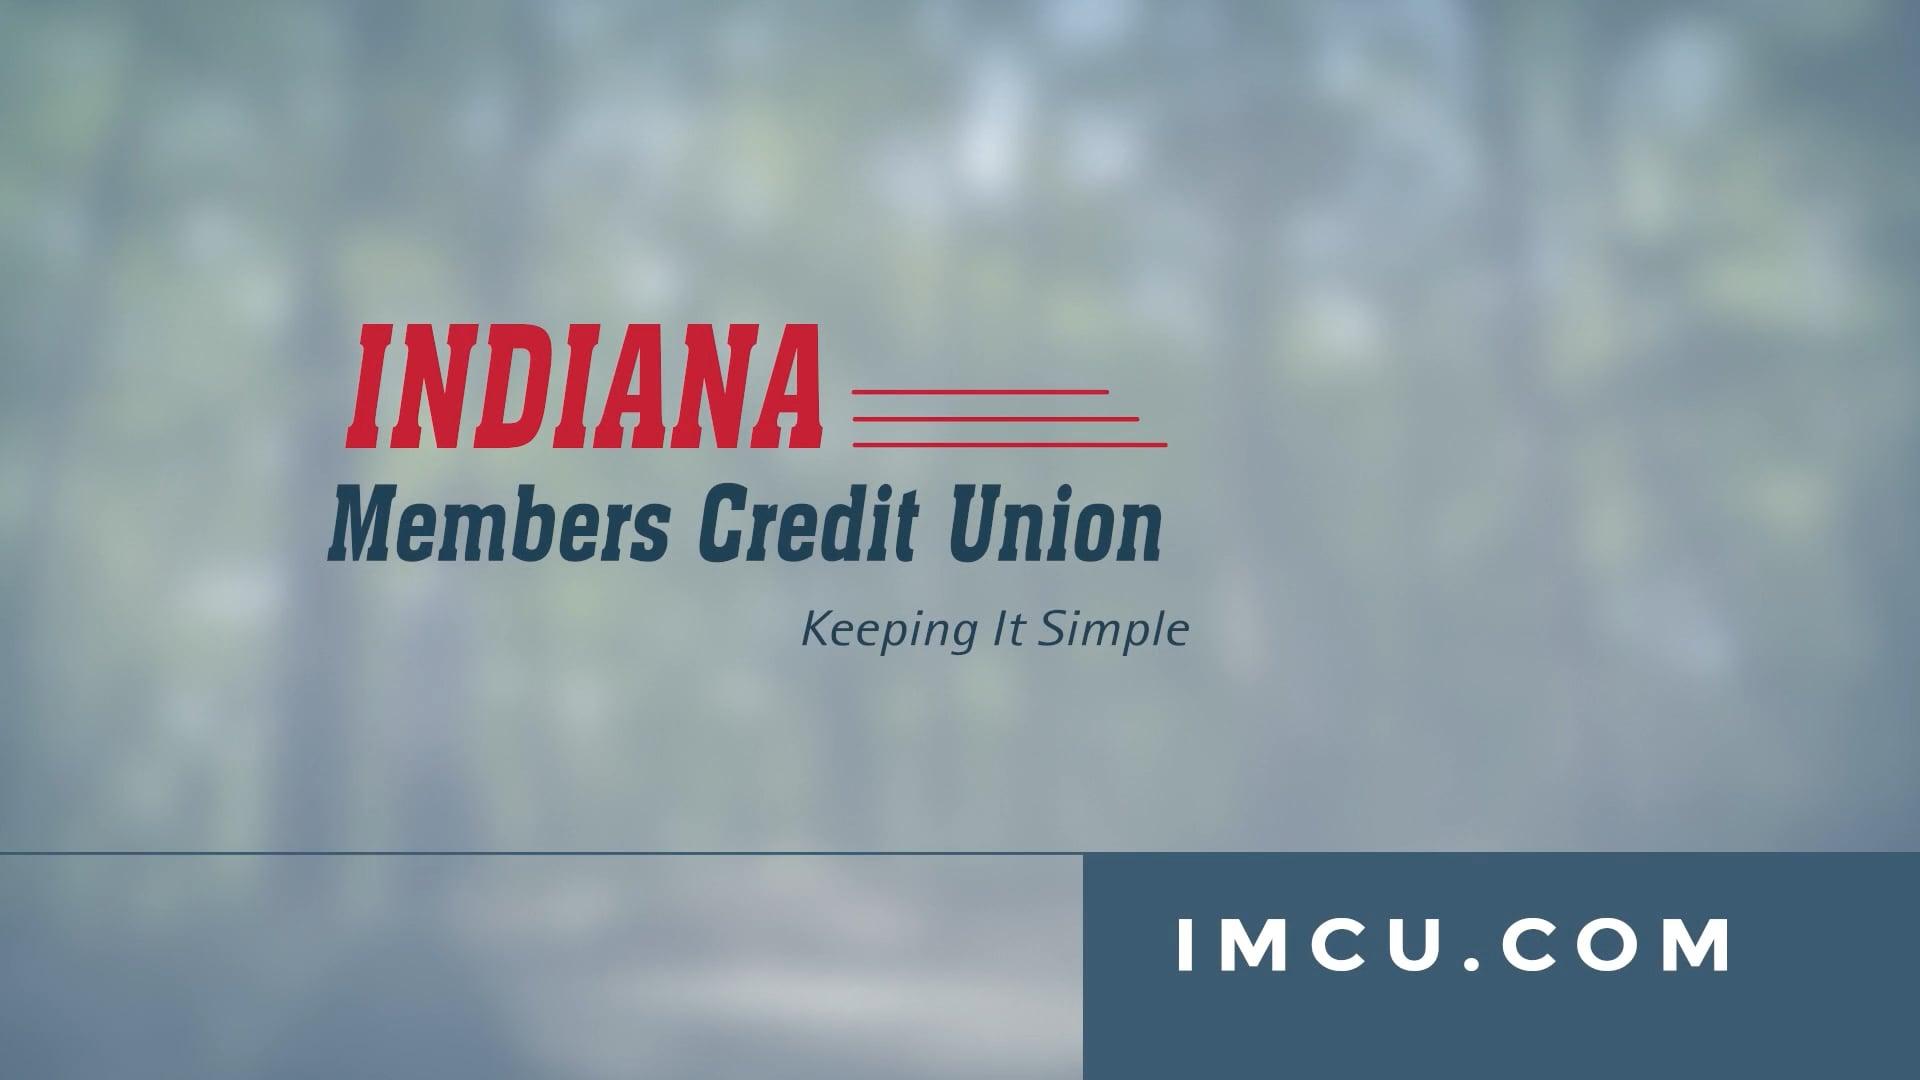 IMCU - Indiana Members Credit Union